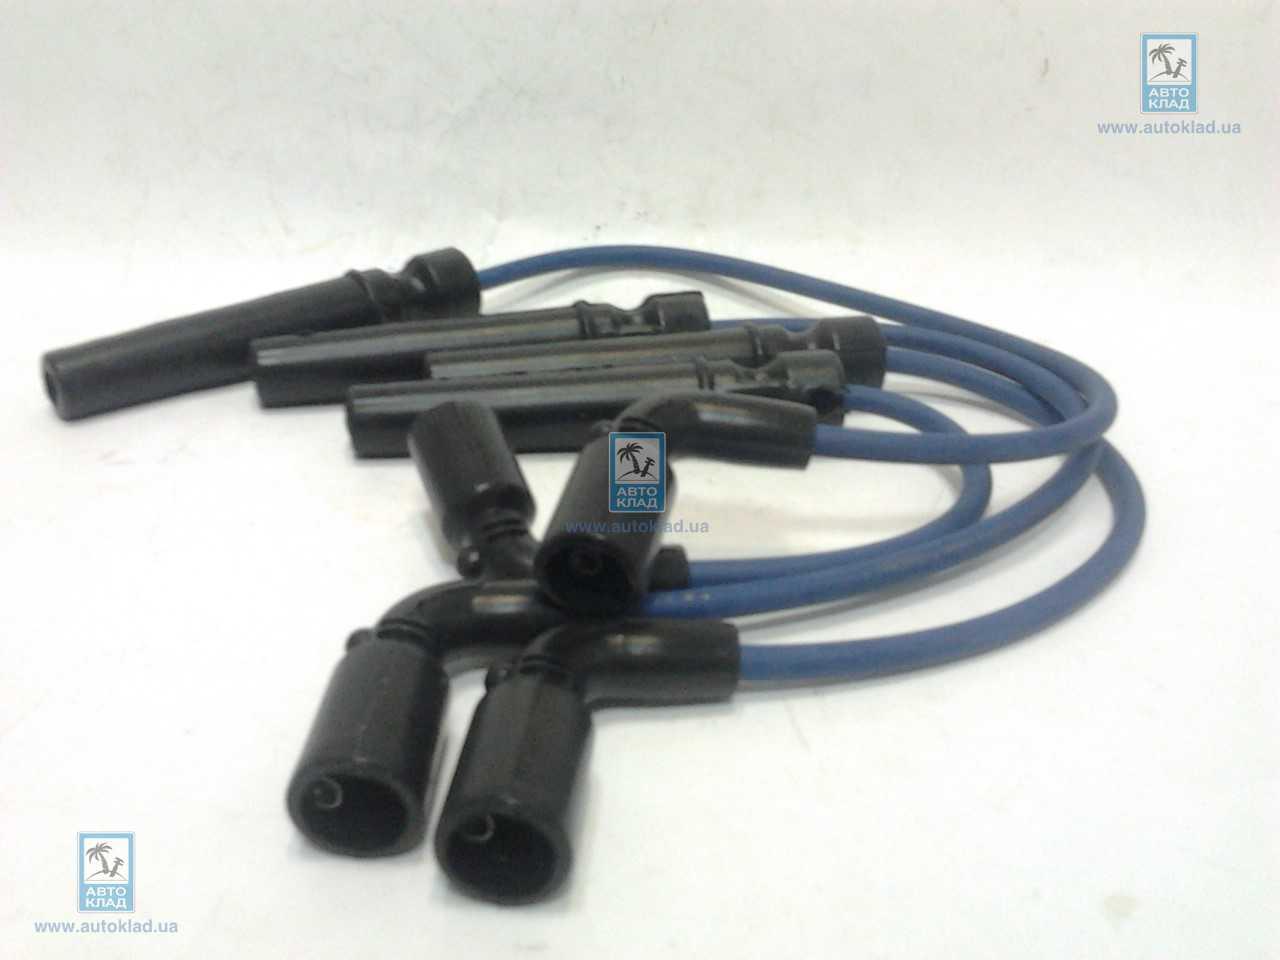 Провода высоковольтные AT 44N